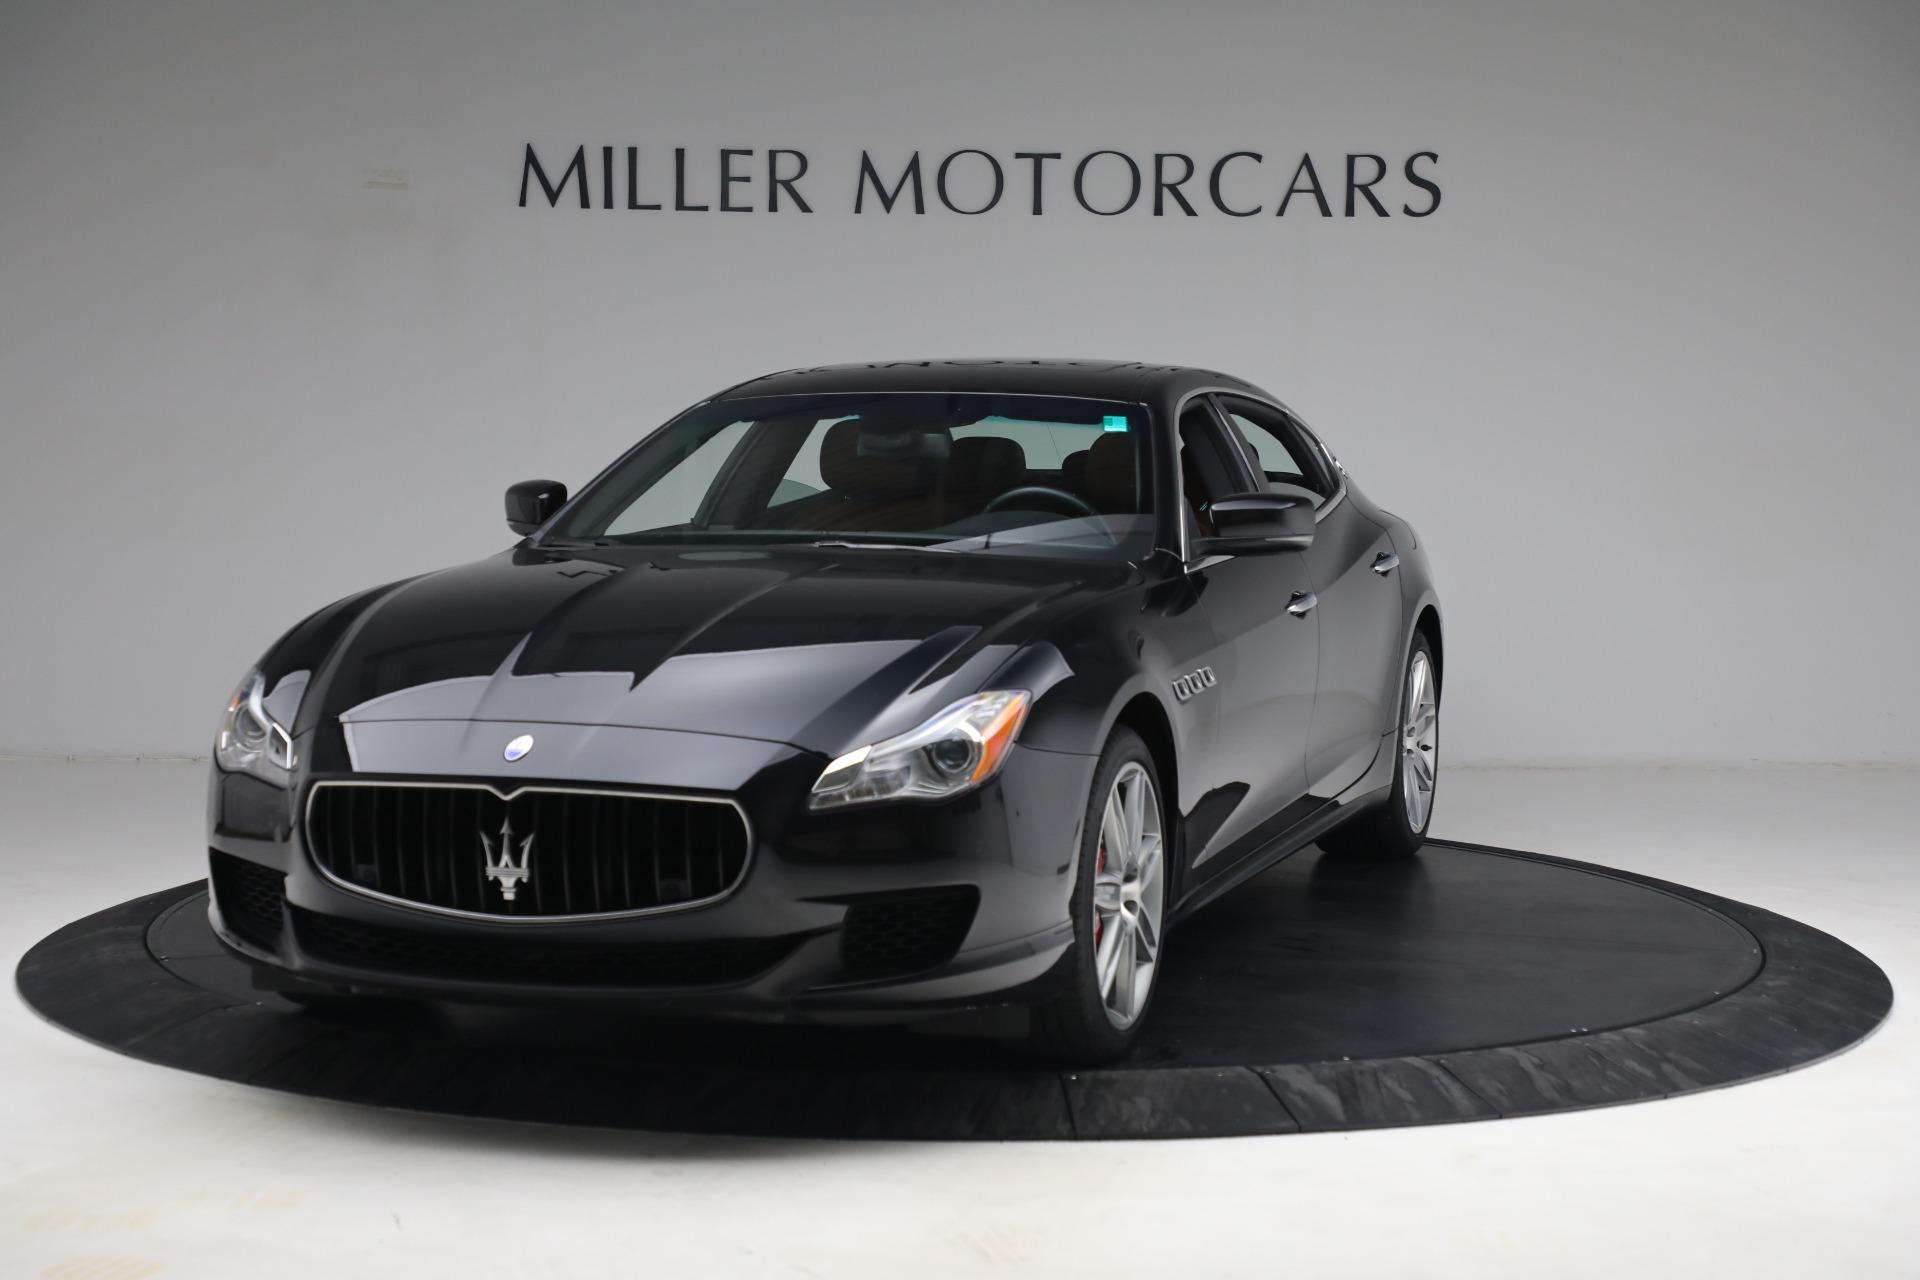 Used 2016 Maserati Quattroporte S Q4 for sale $46,900 at Pagani of Greenwich in Greenwich CT 06830 1